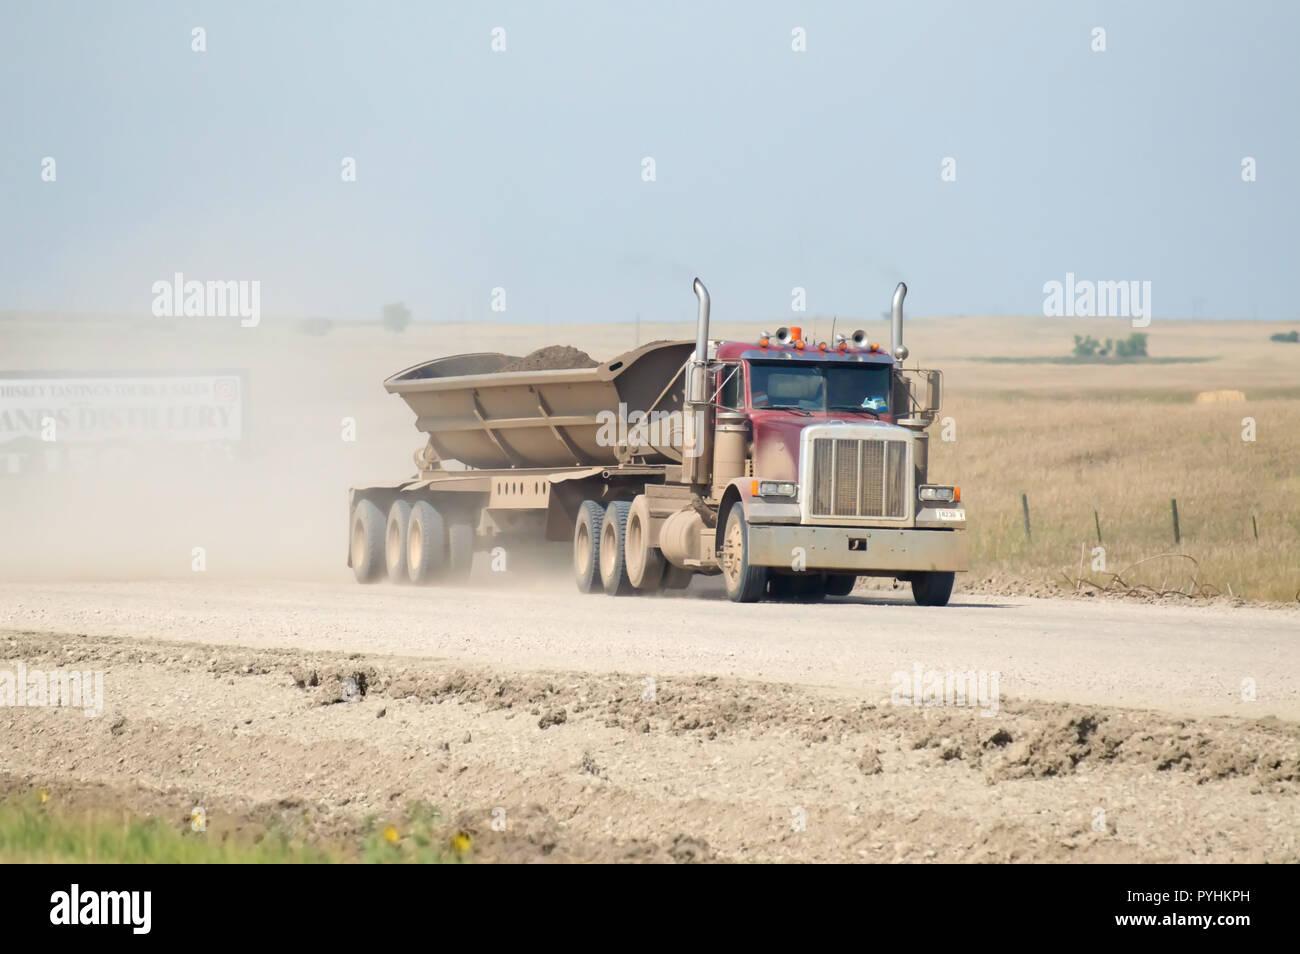 A side dumping semi truck hauling dirt down a dusty desert road. - Stock Image